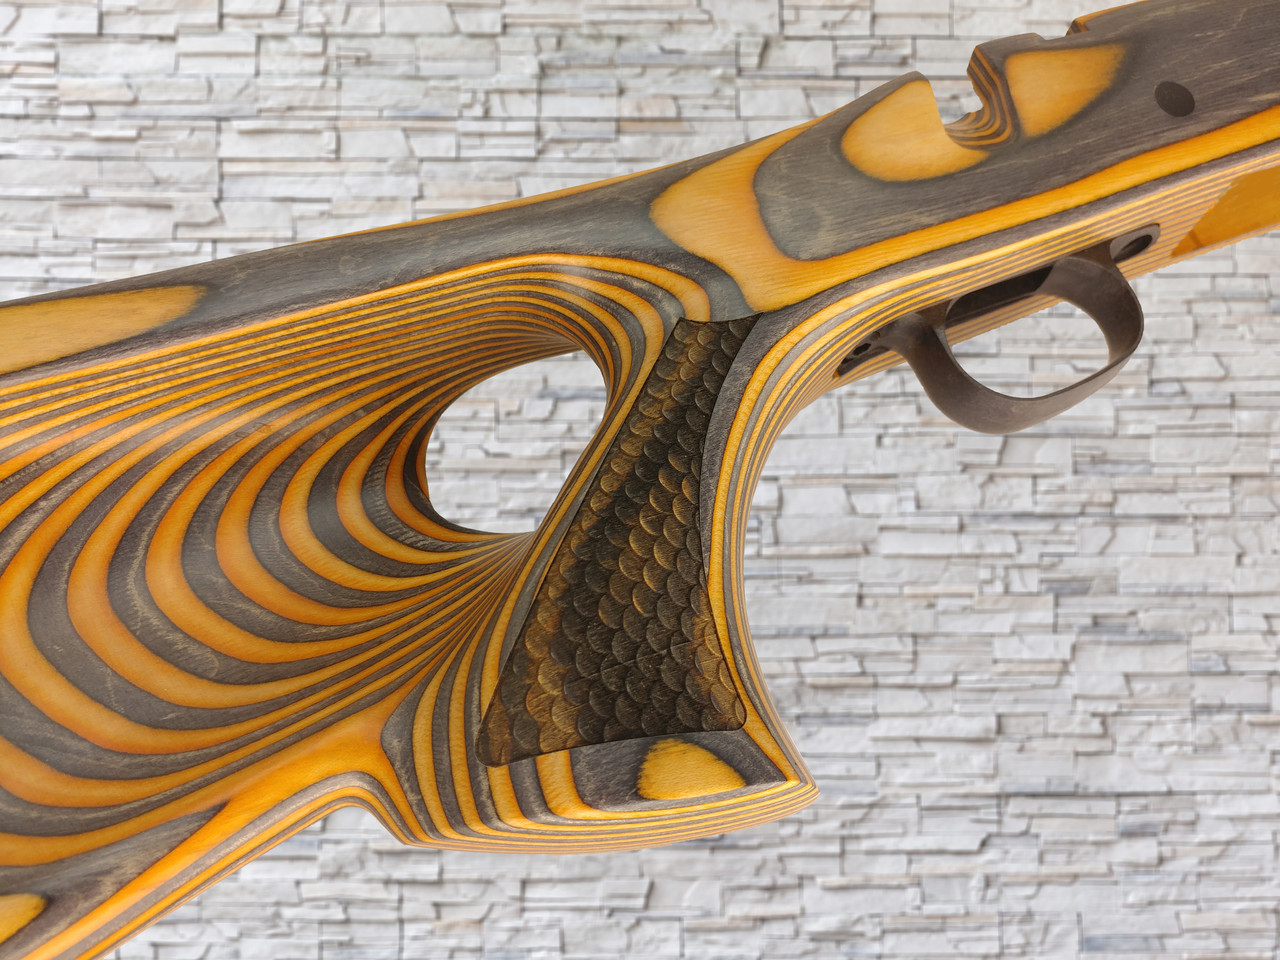 Boyds FW Wood Stock Scale Texturing Blaze for Savage AXIS SA Bull Barrel  Rifle